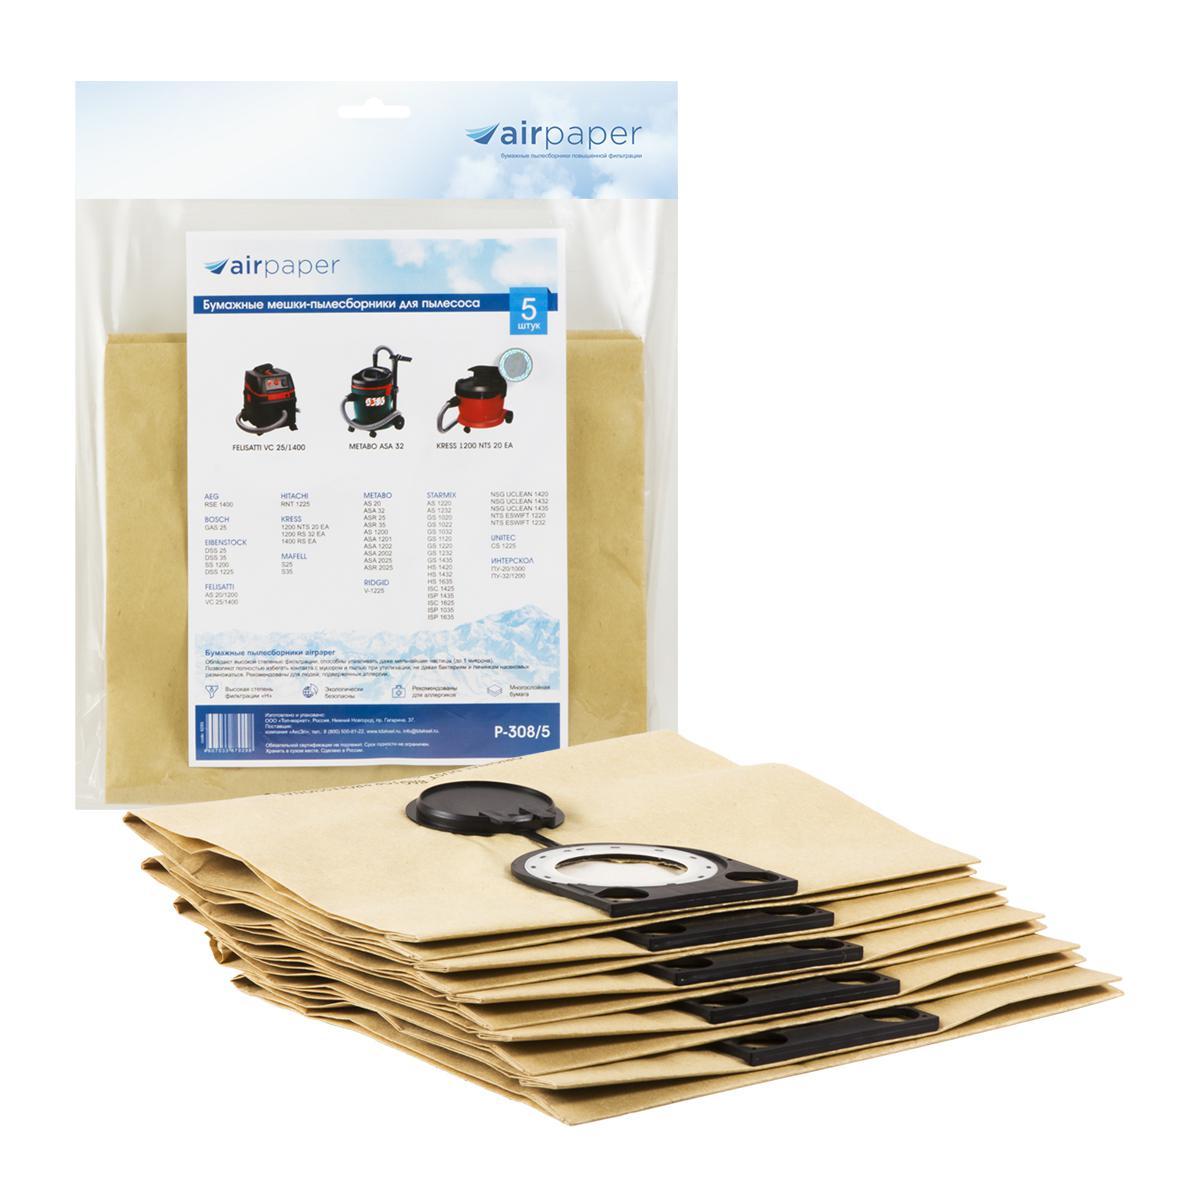 Мешок Air paper P-308/5 мешок air paper p 3031